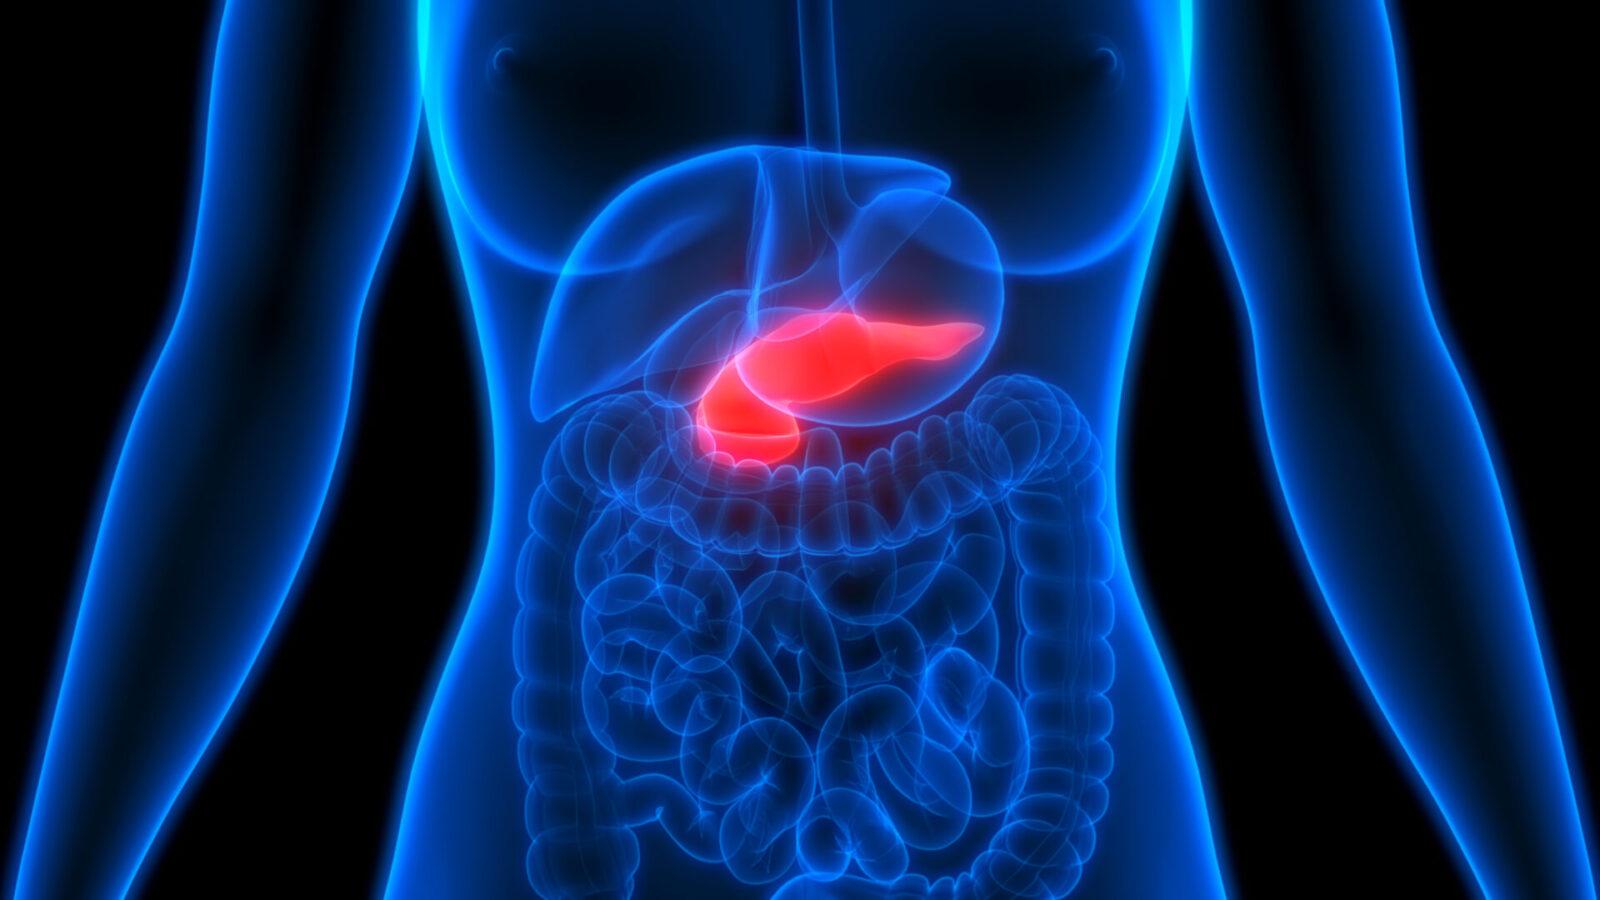 simptome de tratament helmintii hpv et infidelite